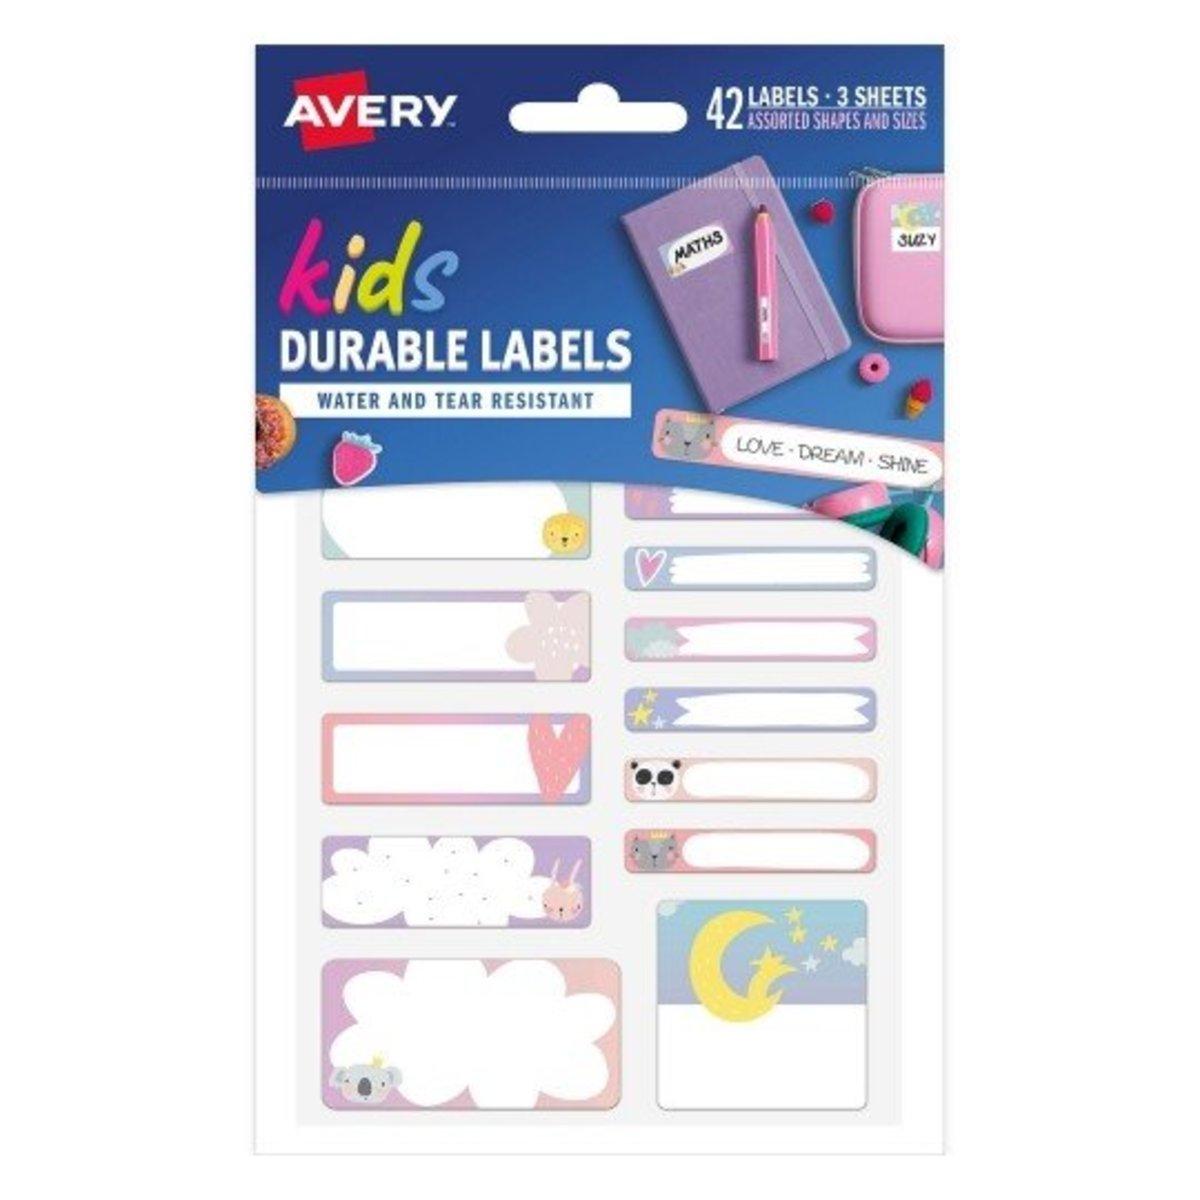 Avery - Love Dream Shine School Labels 41419